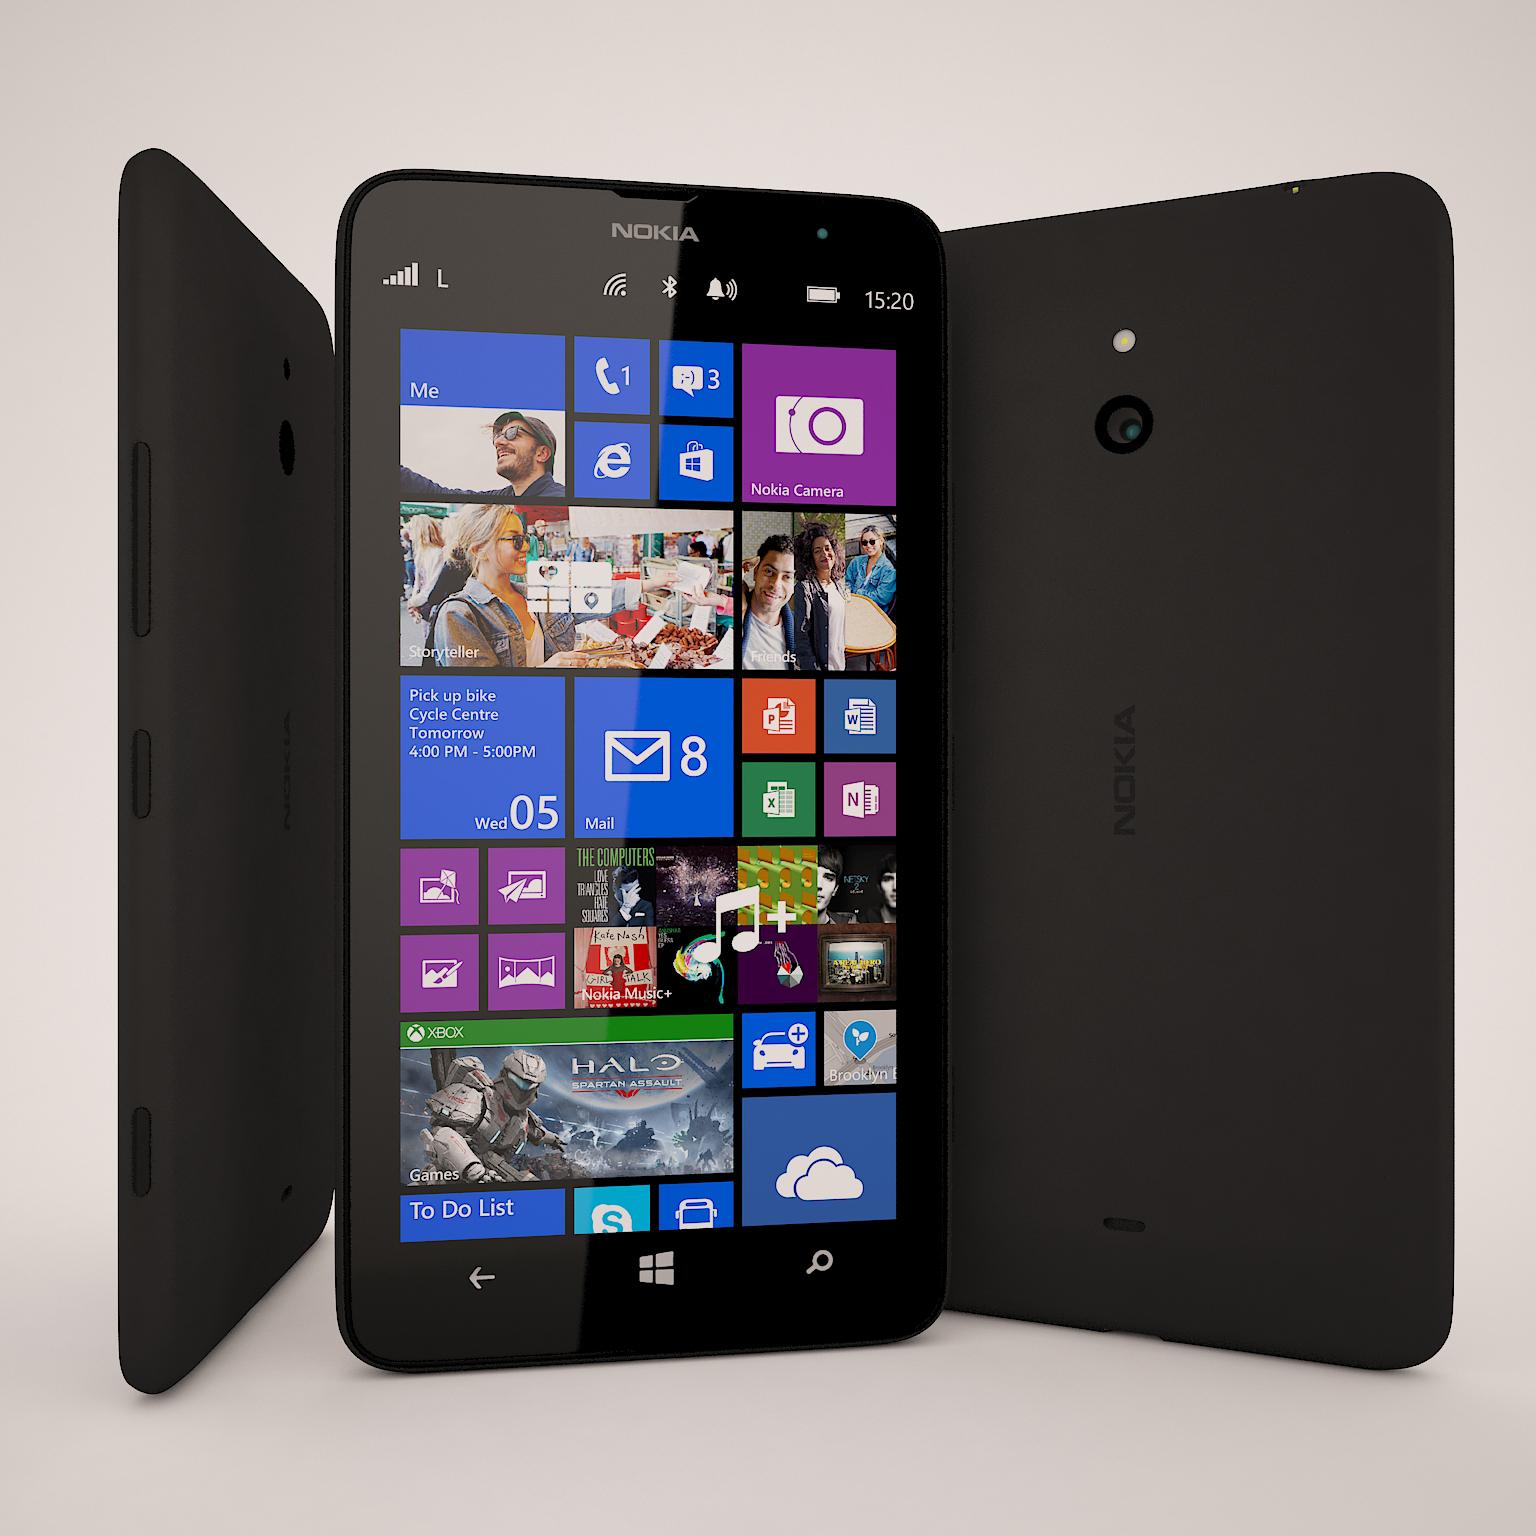 Nokia Lumia 1320 Cricket